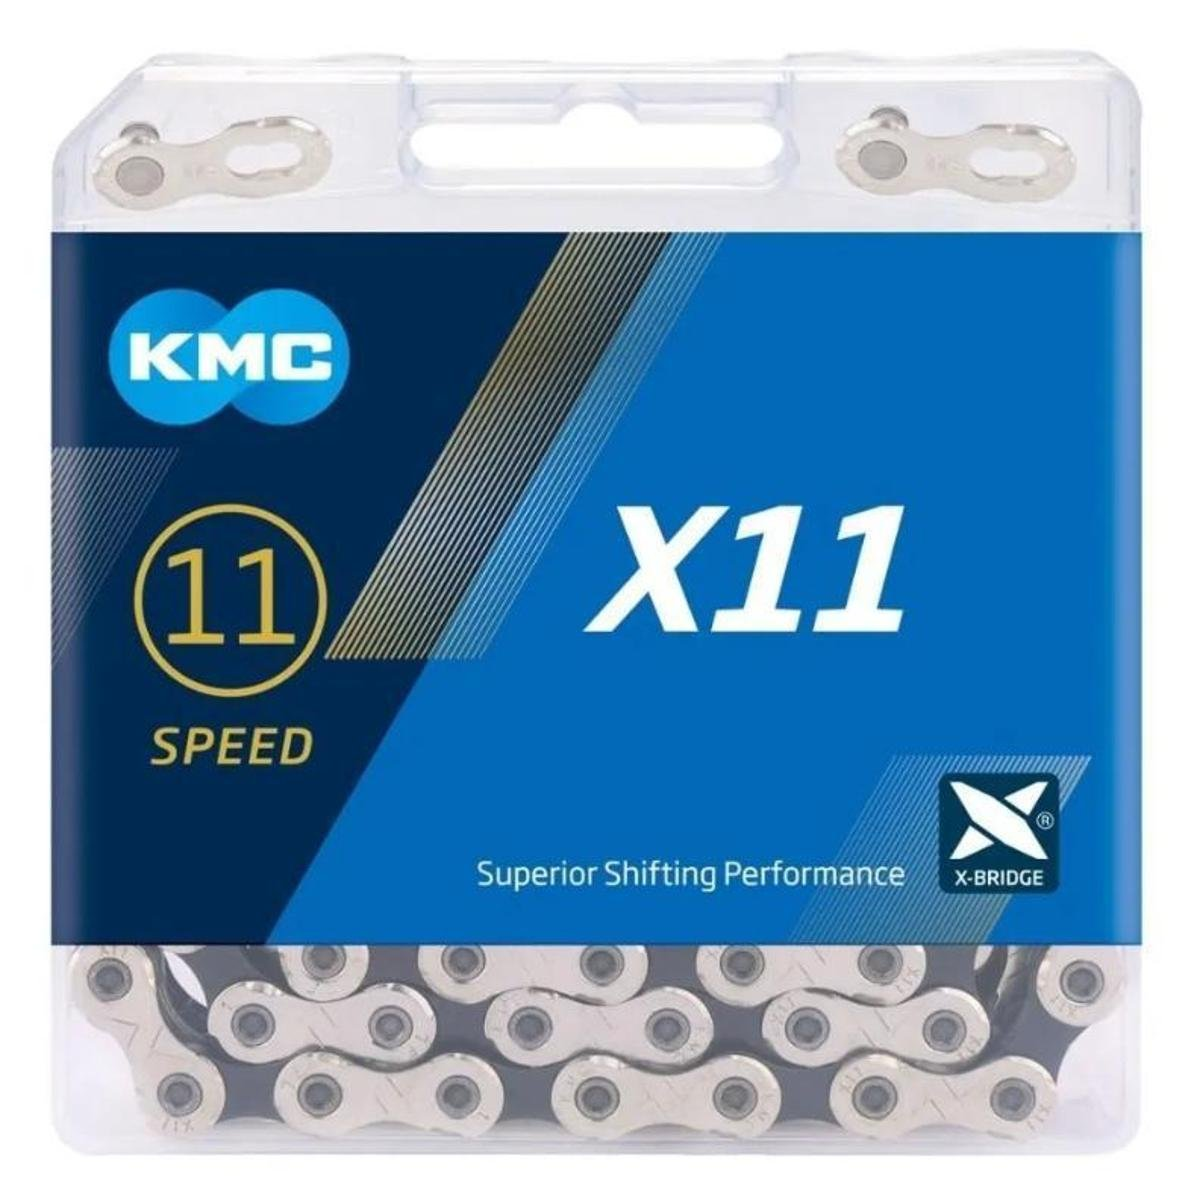 Corrente KMC X11 11V - Prata